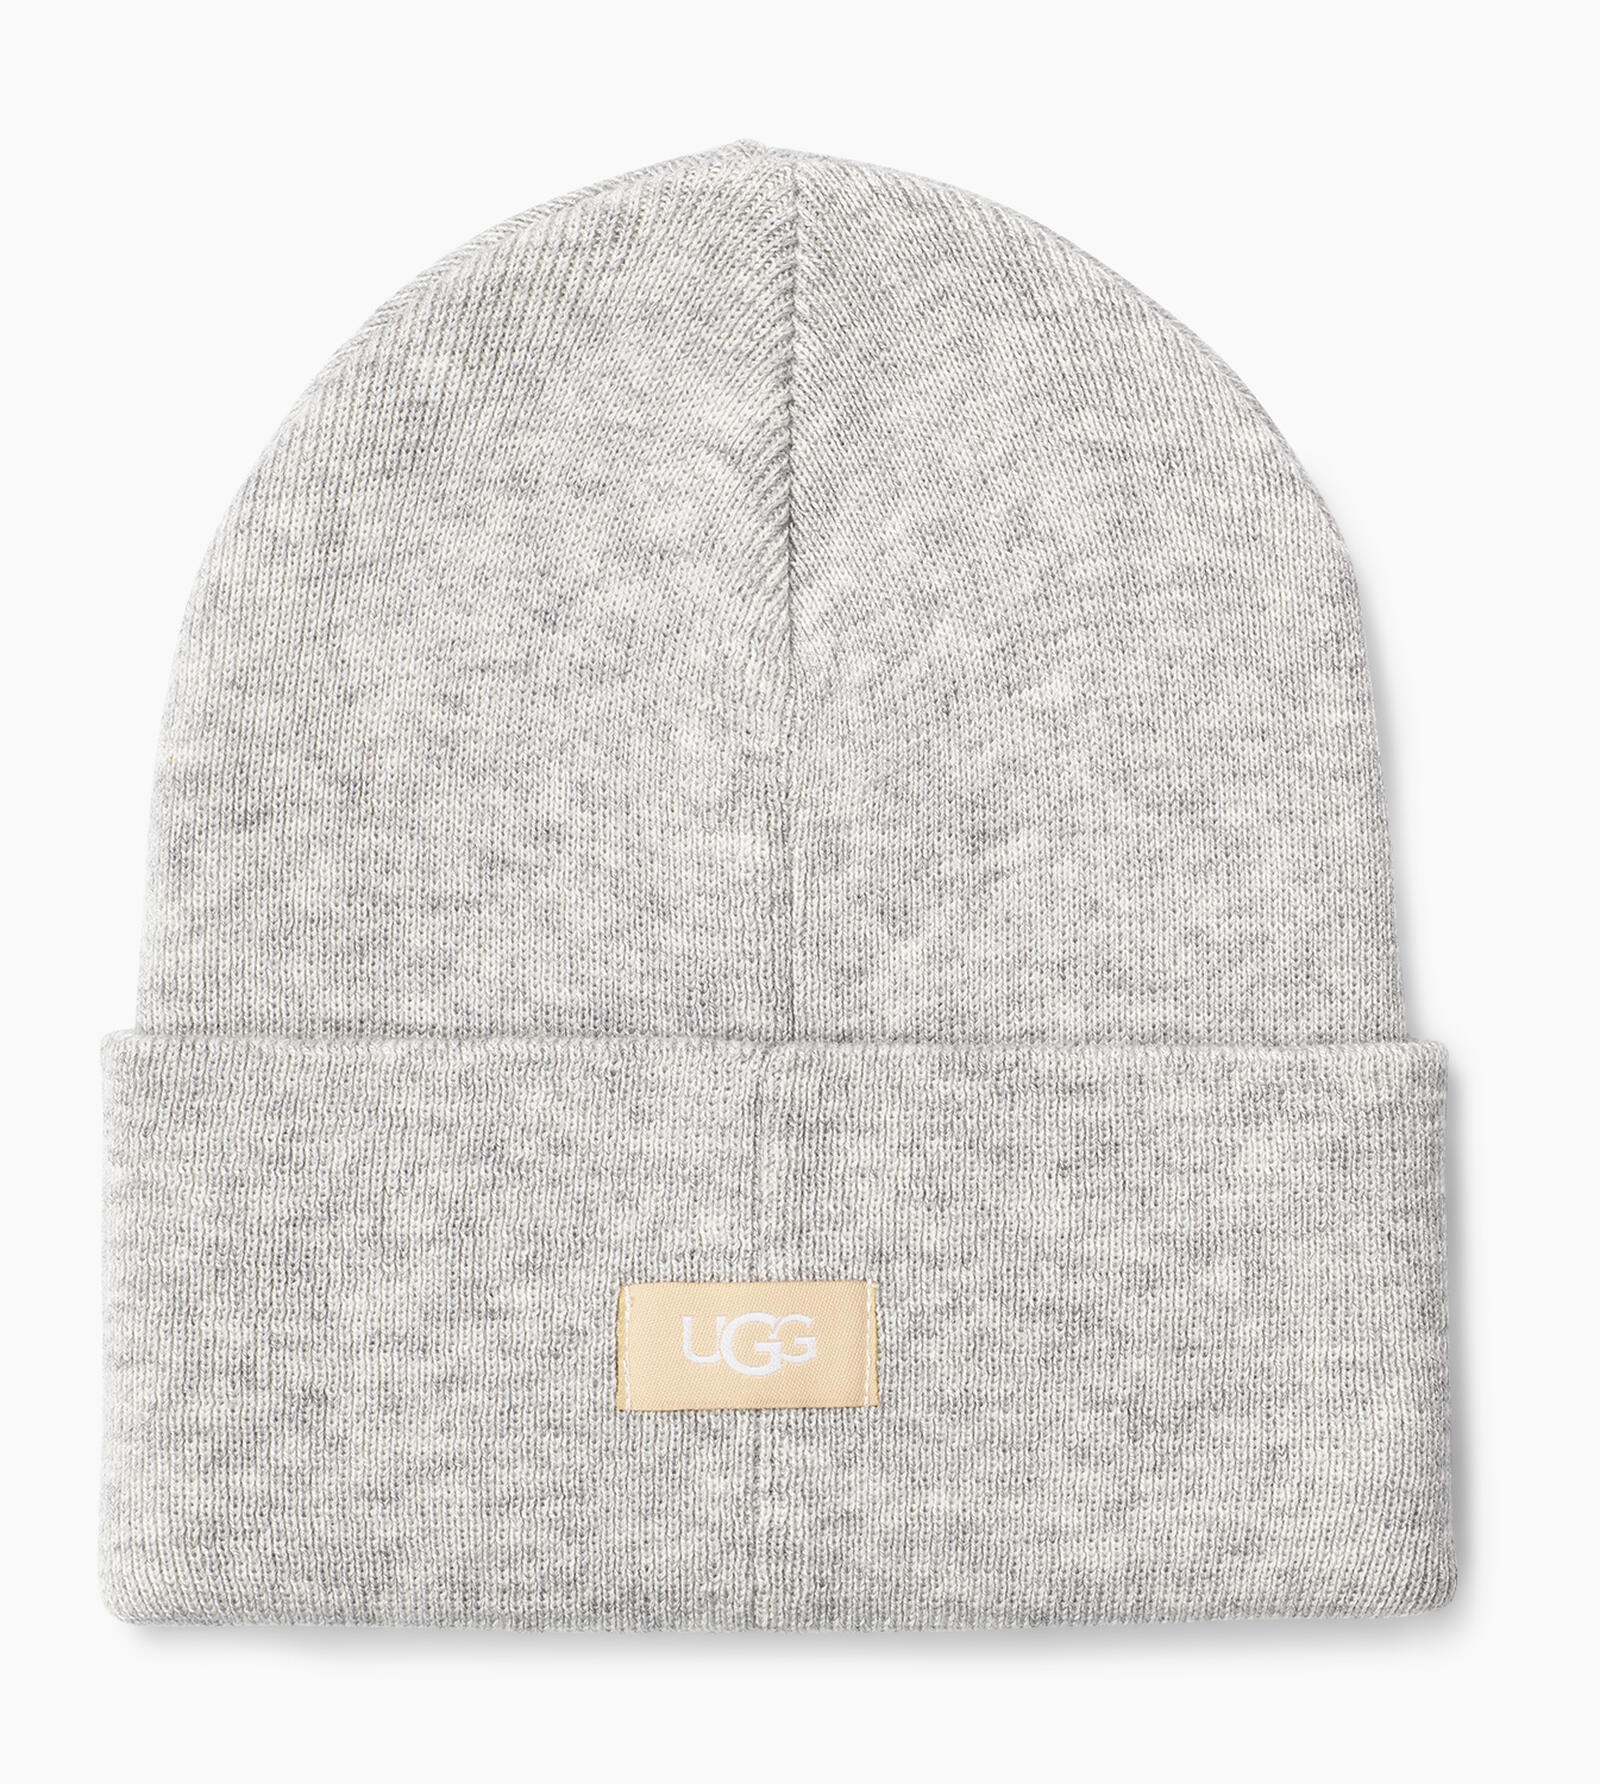 Knit Cuff Chapeaux